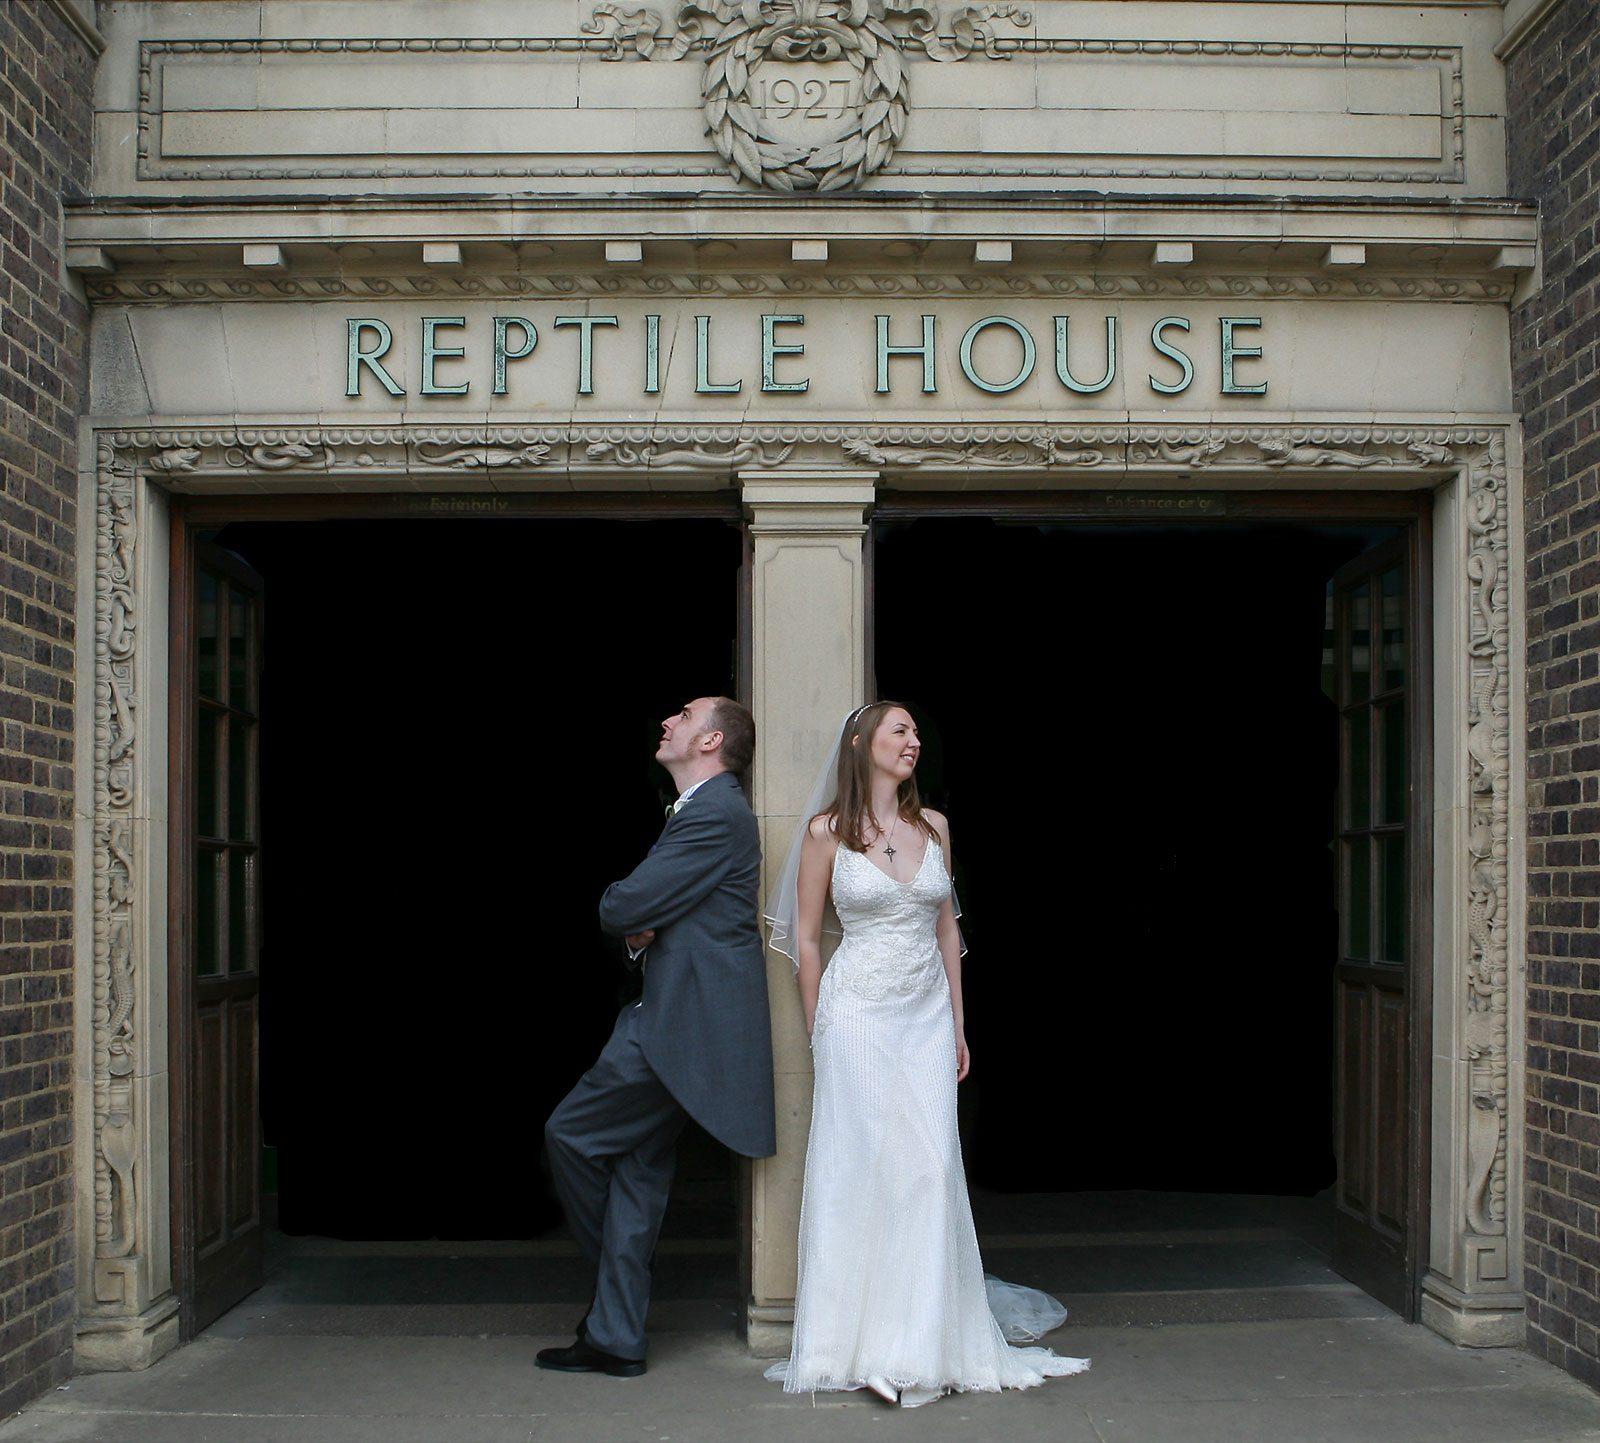 Reptile House London Zoo wedding